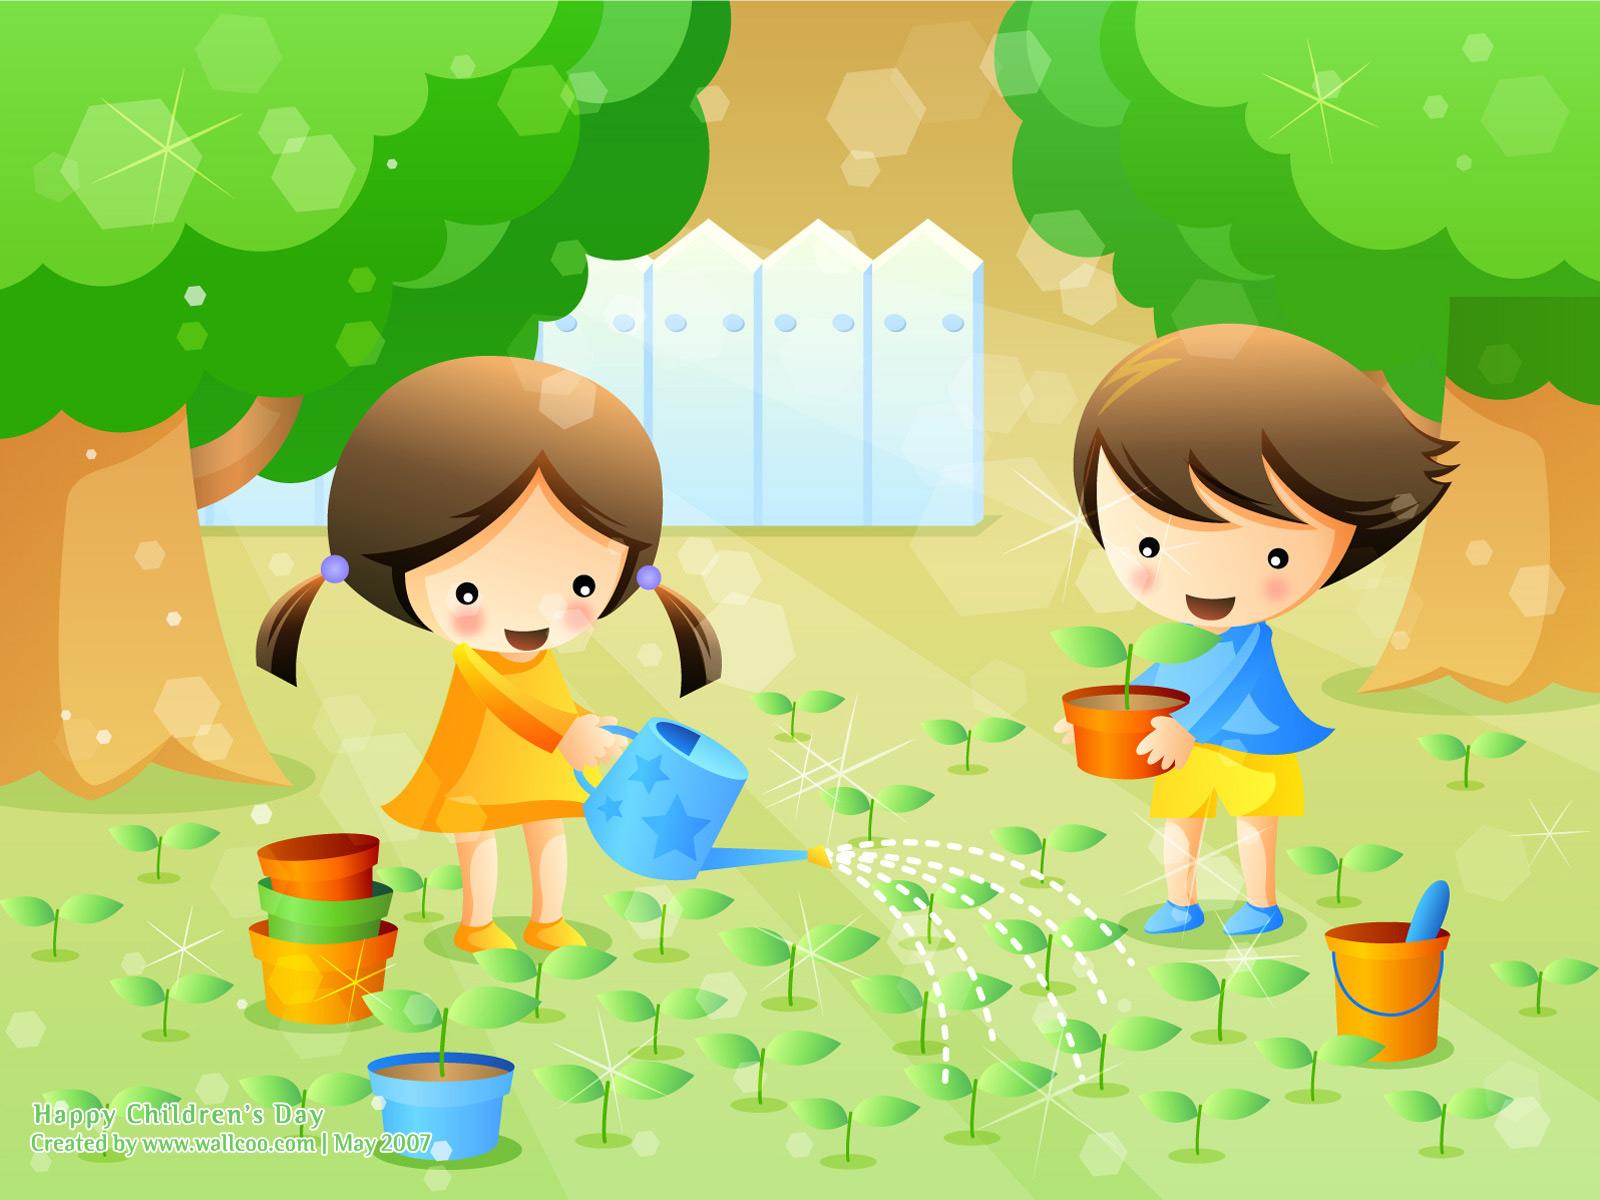 PicturesPool: Children's Day Wallpaper Greetings | Kids,Fun,Drawing,Art,Cartoon